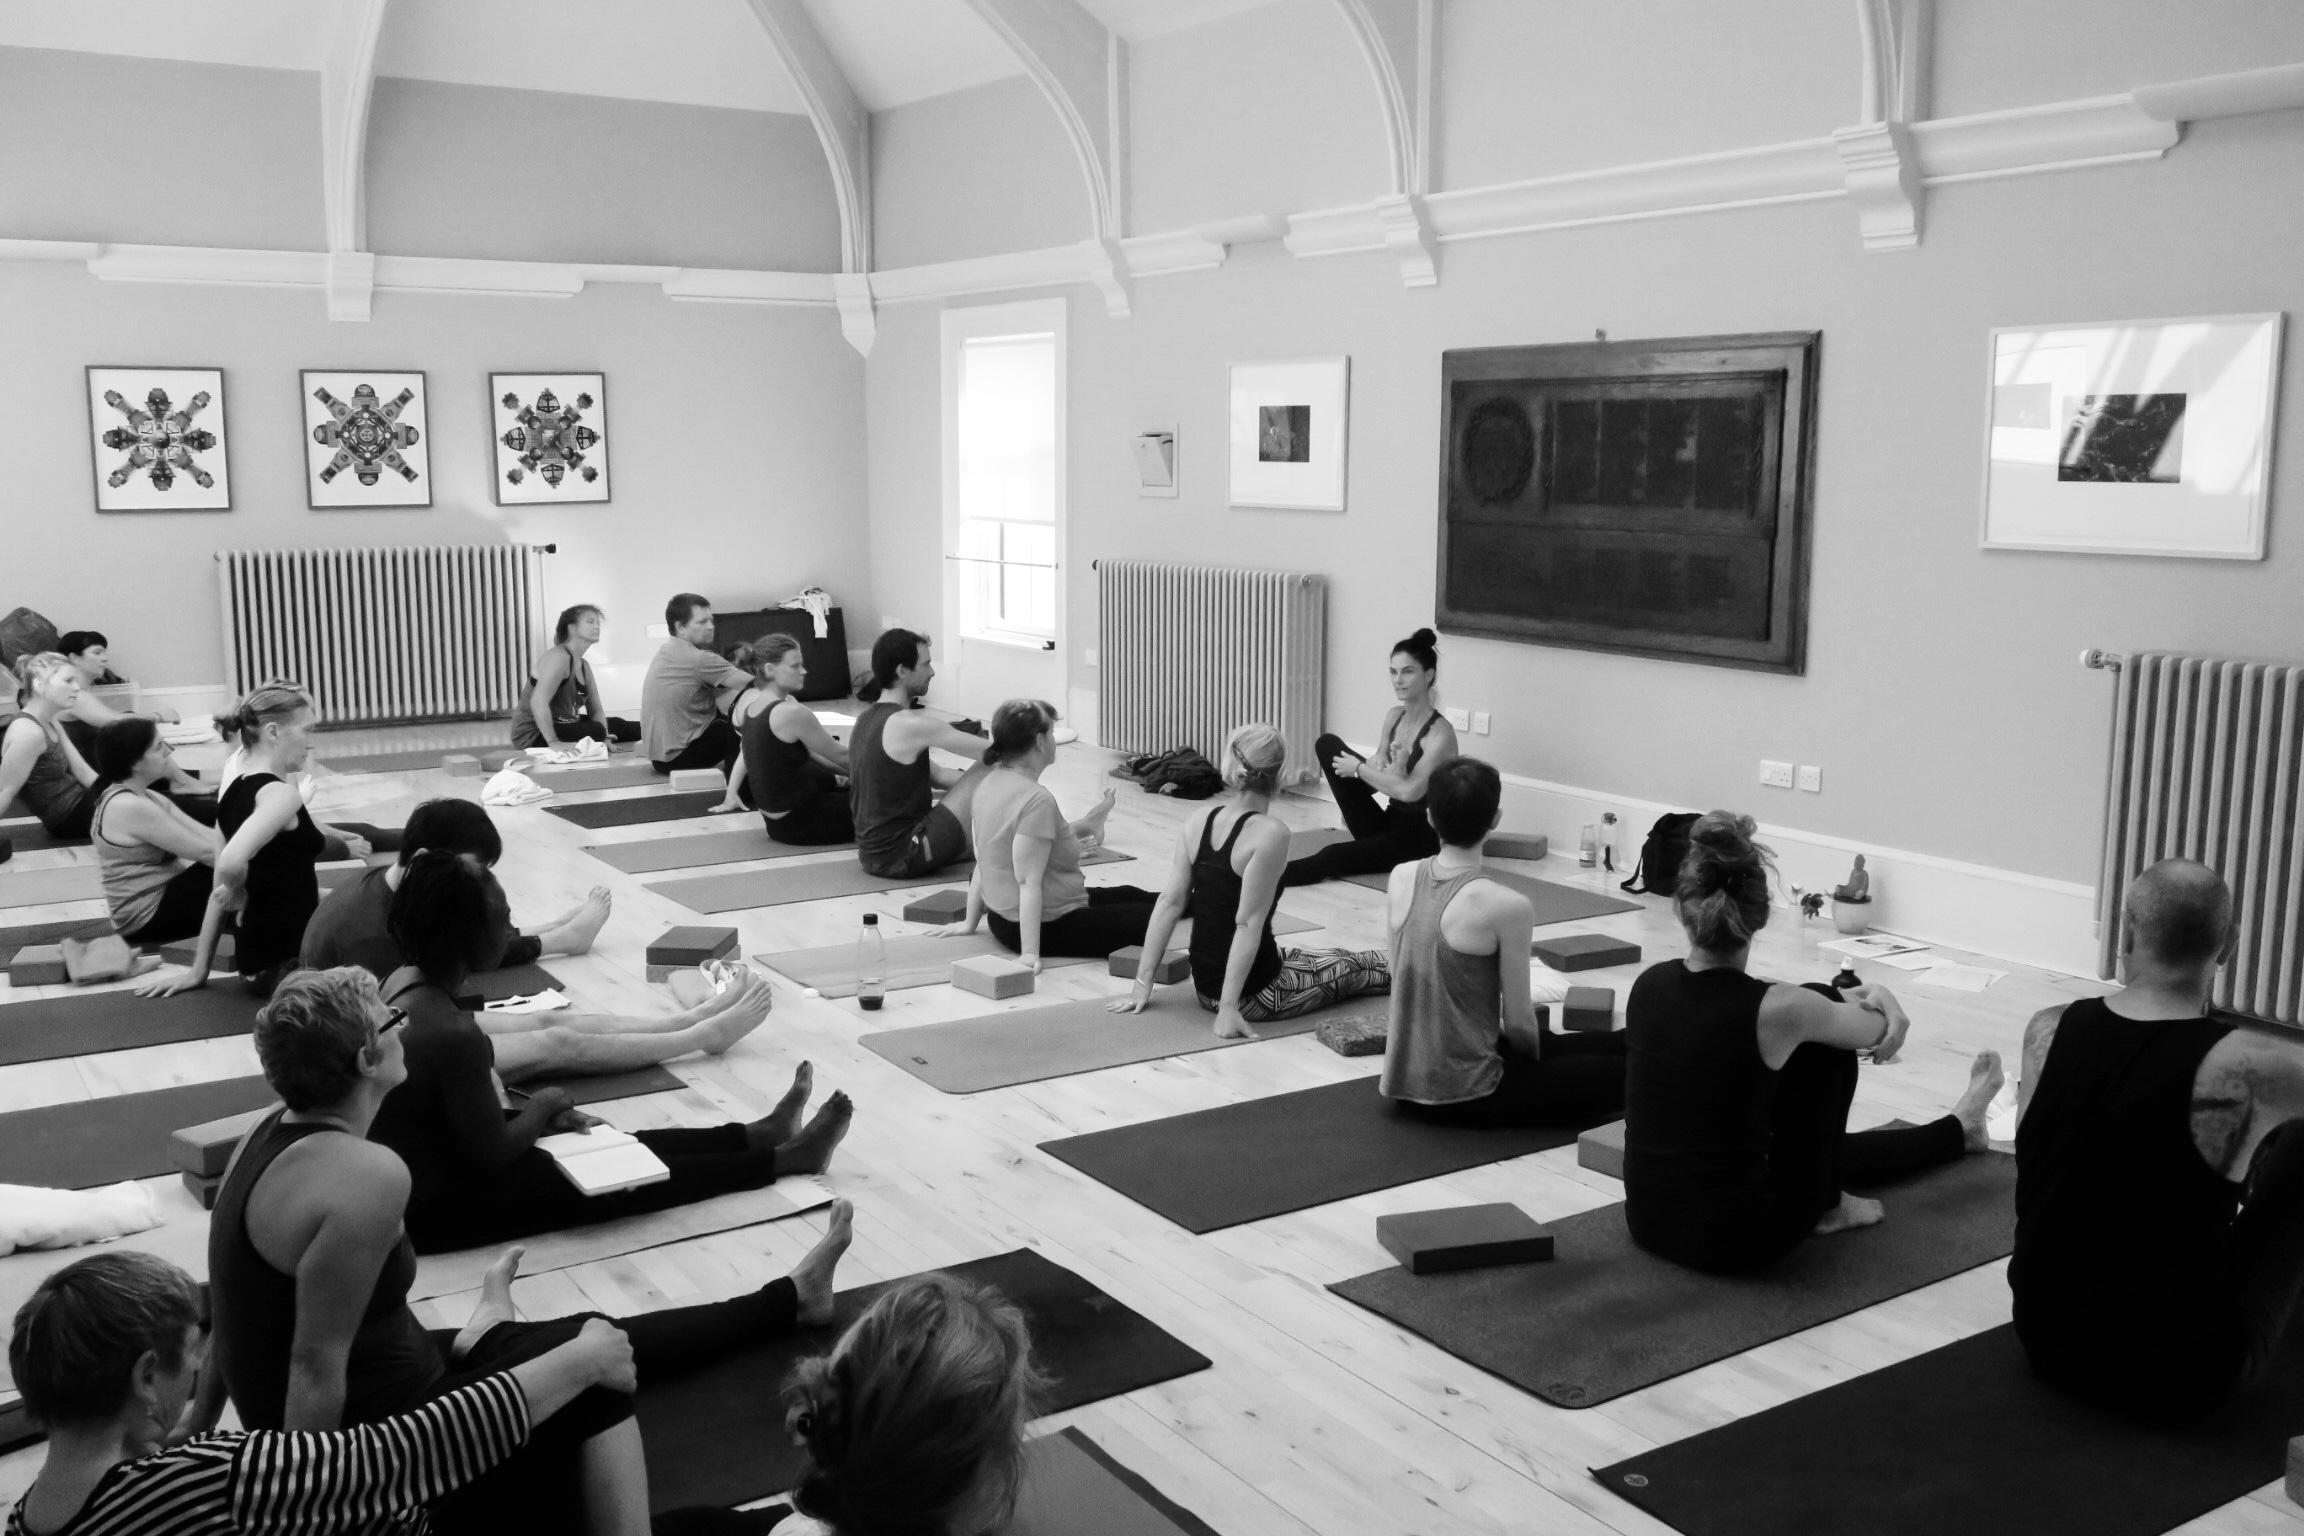 Workshop with Kia Naddermier at Rosina Bonsu Moves at the Arlington Baths Club in Glasgow